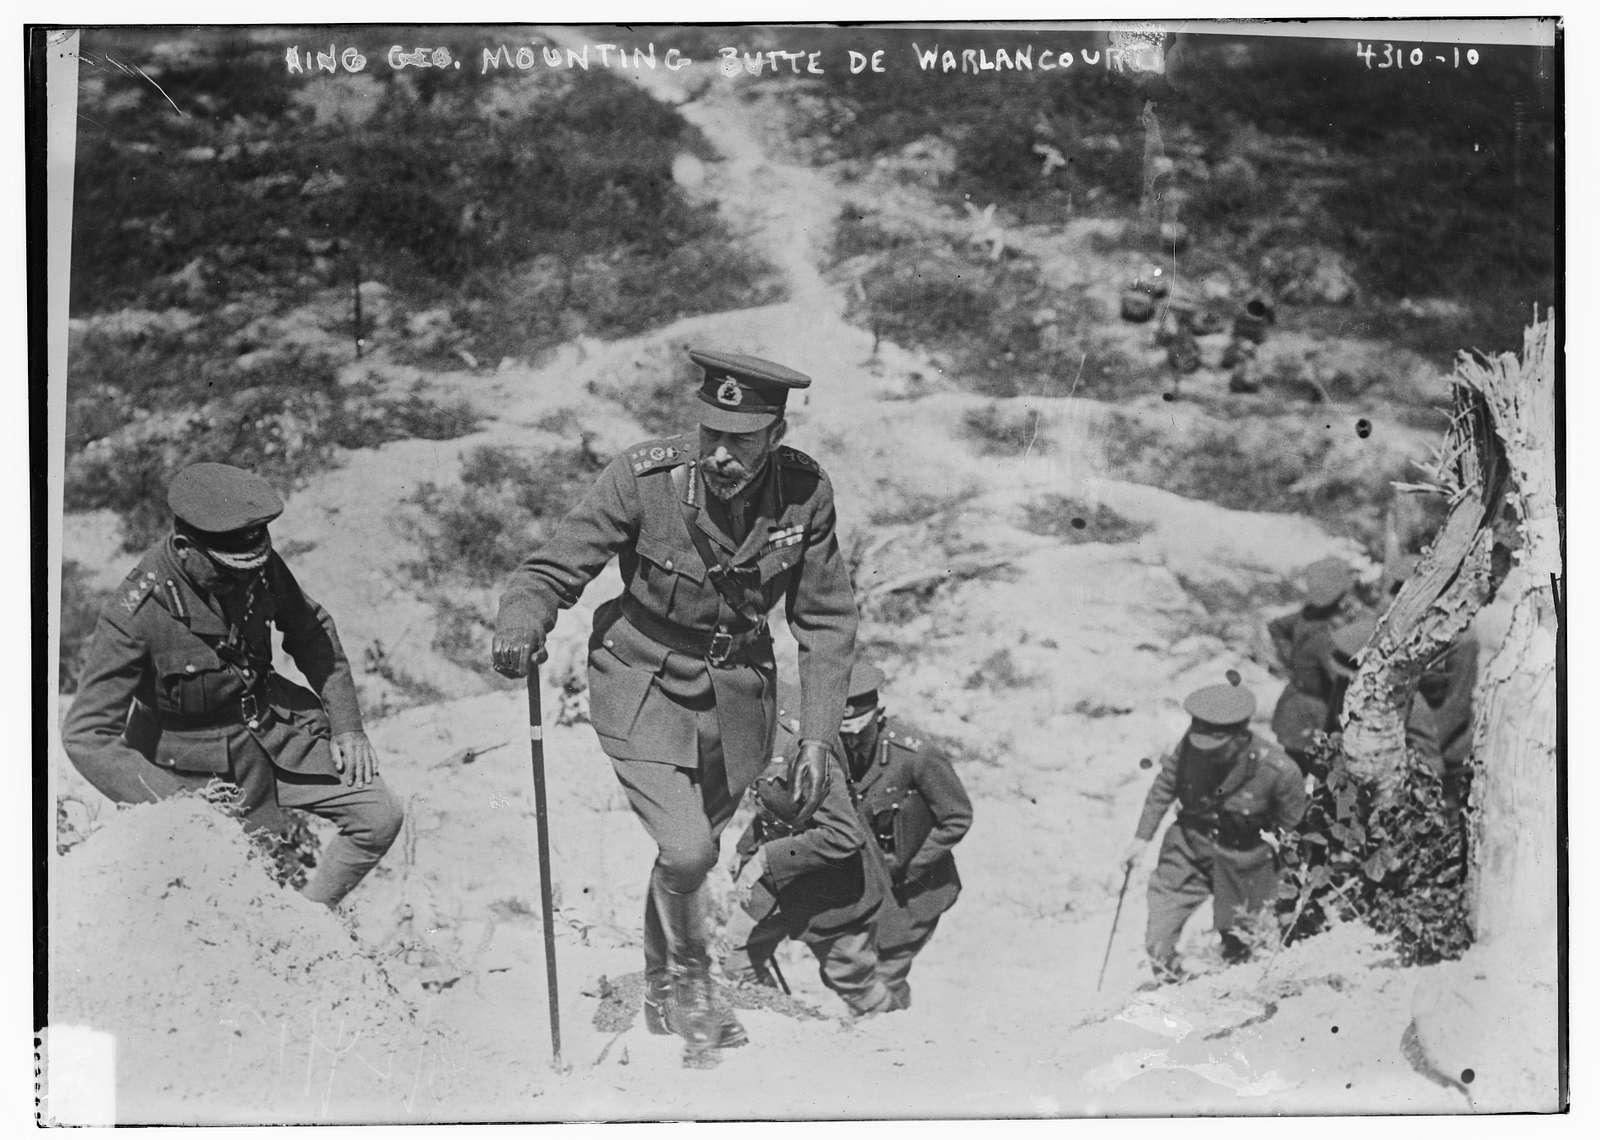 King Geo. mounting Butte De Warlancourt i.e. Warlencourt